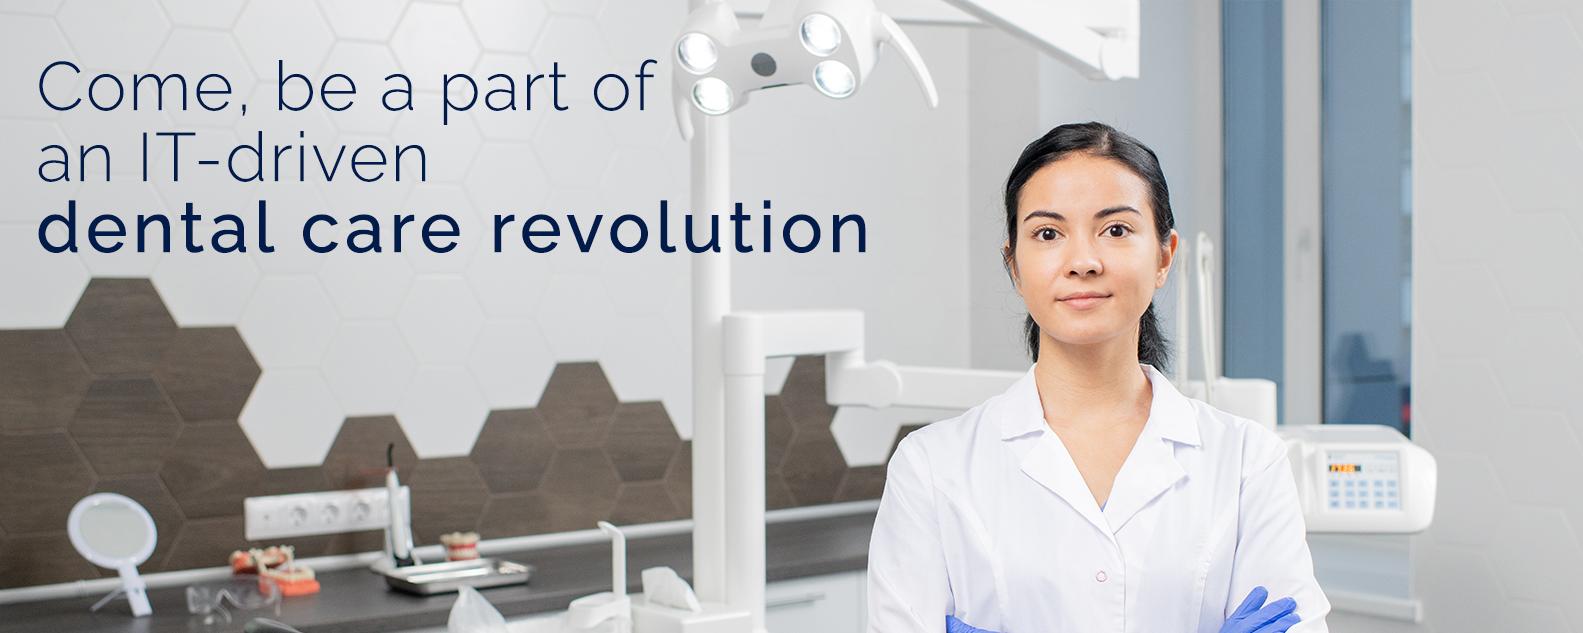 dental care revolution